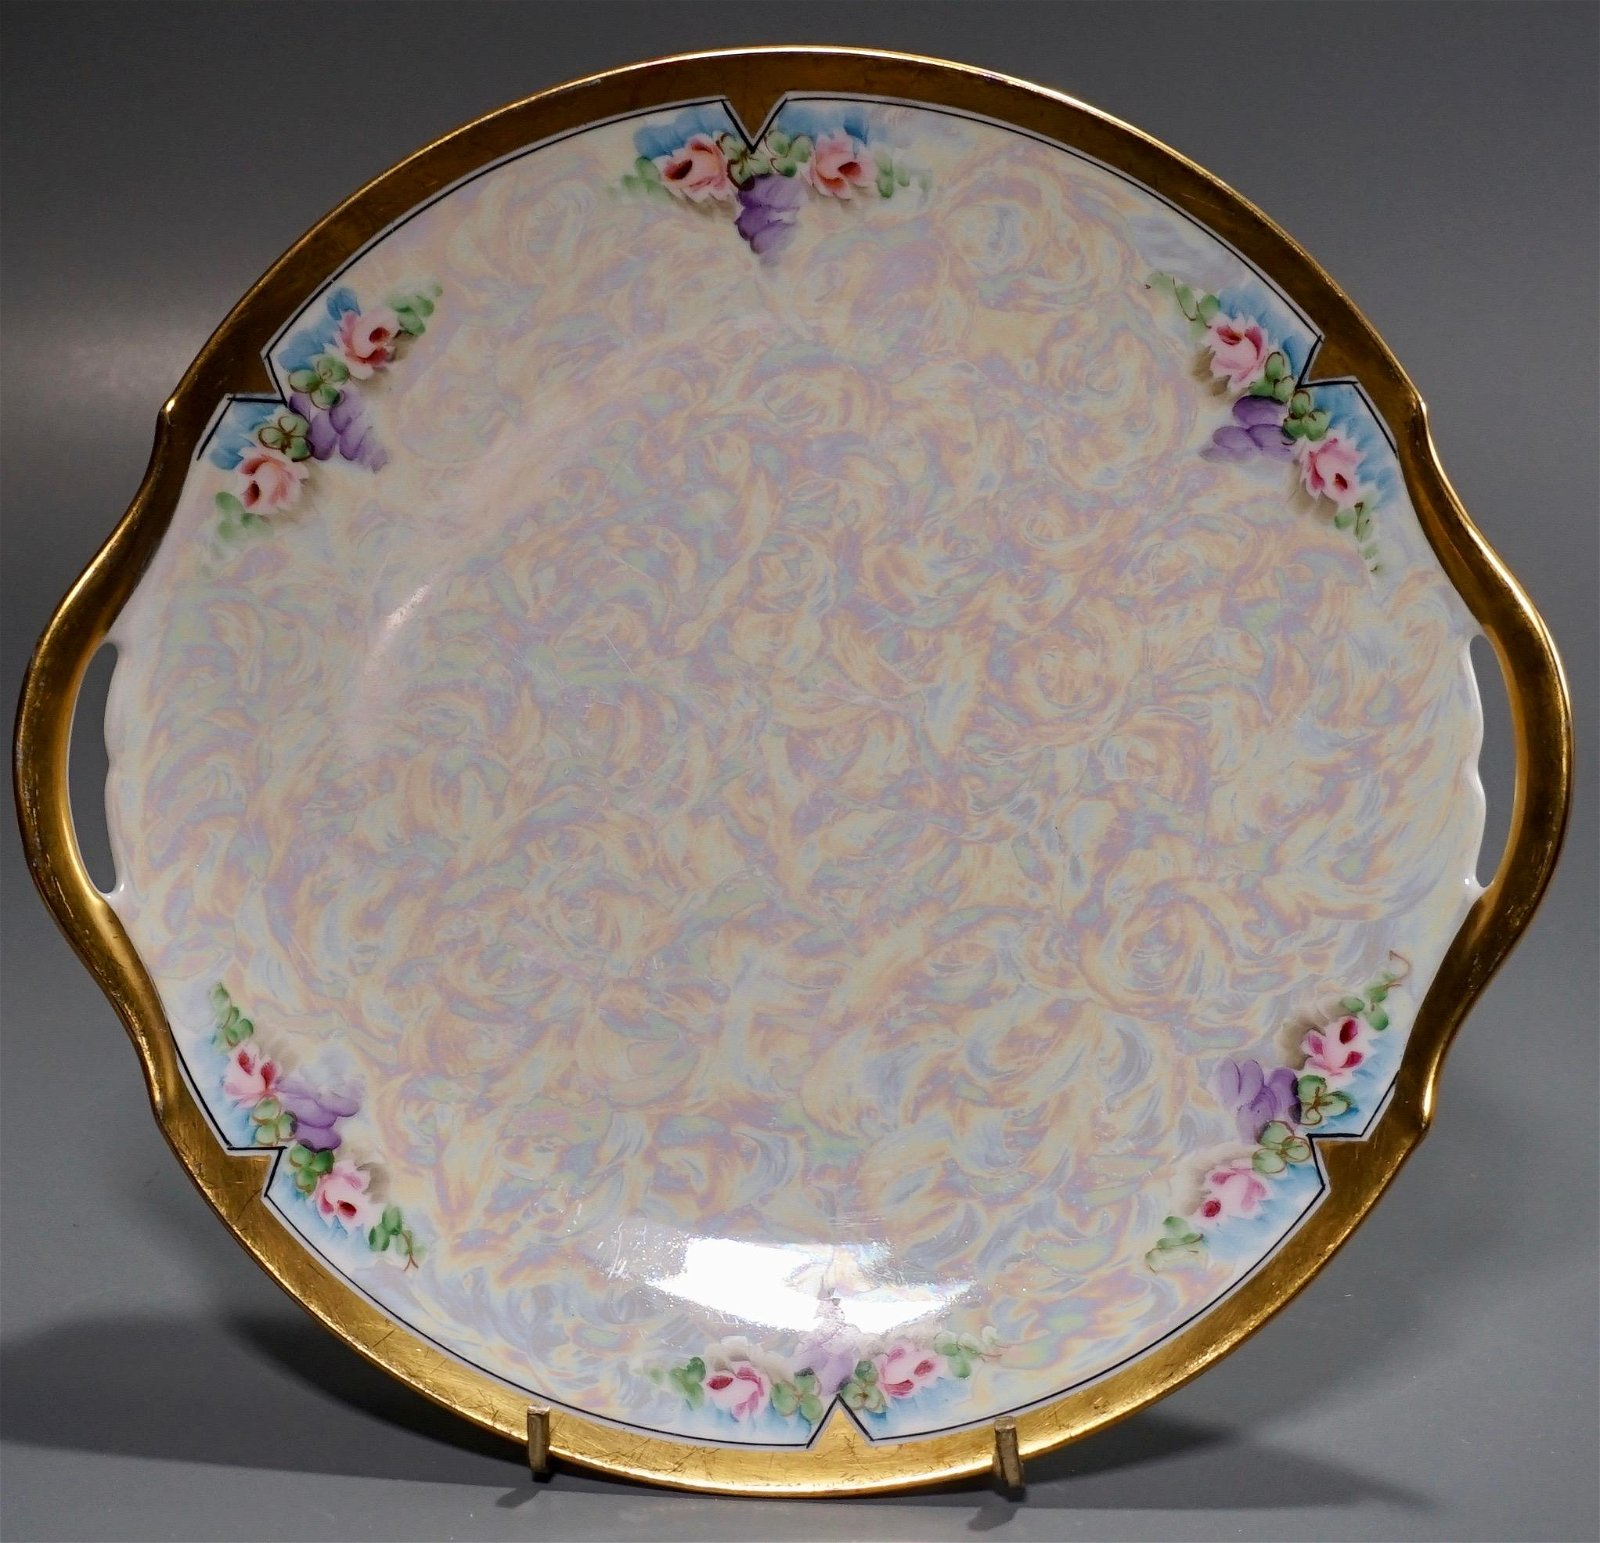 Art Nouveau Iridescent Porcelain Cake Plate Artist